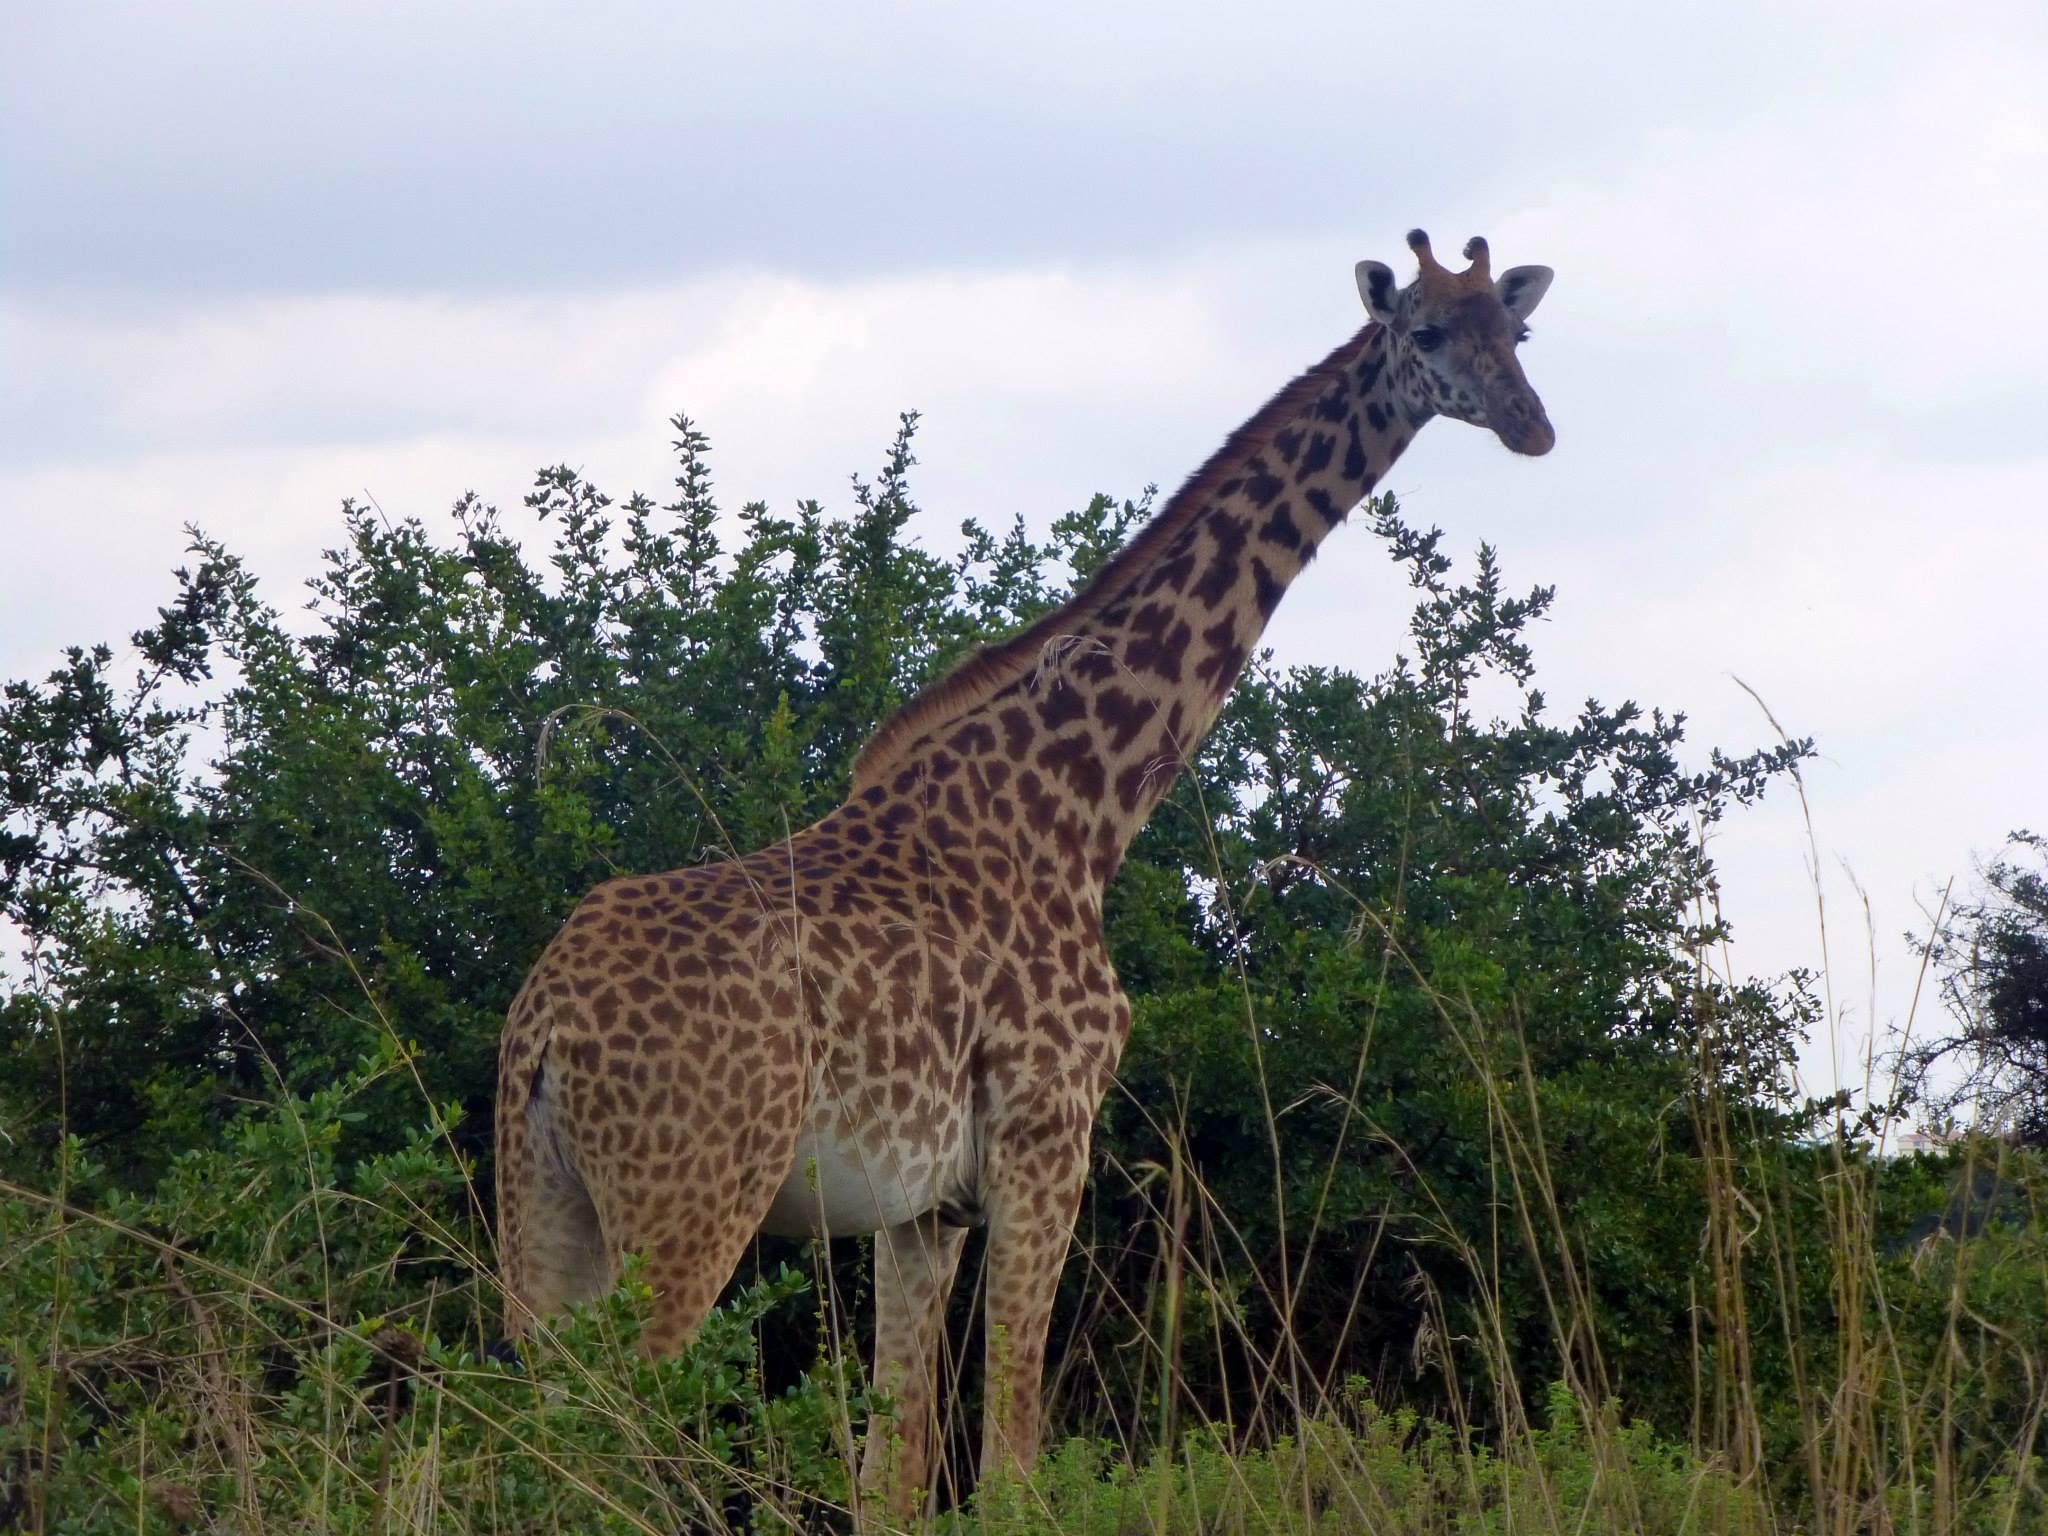 Giraffe in Nairobi National Park - Safari In Kenya